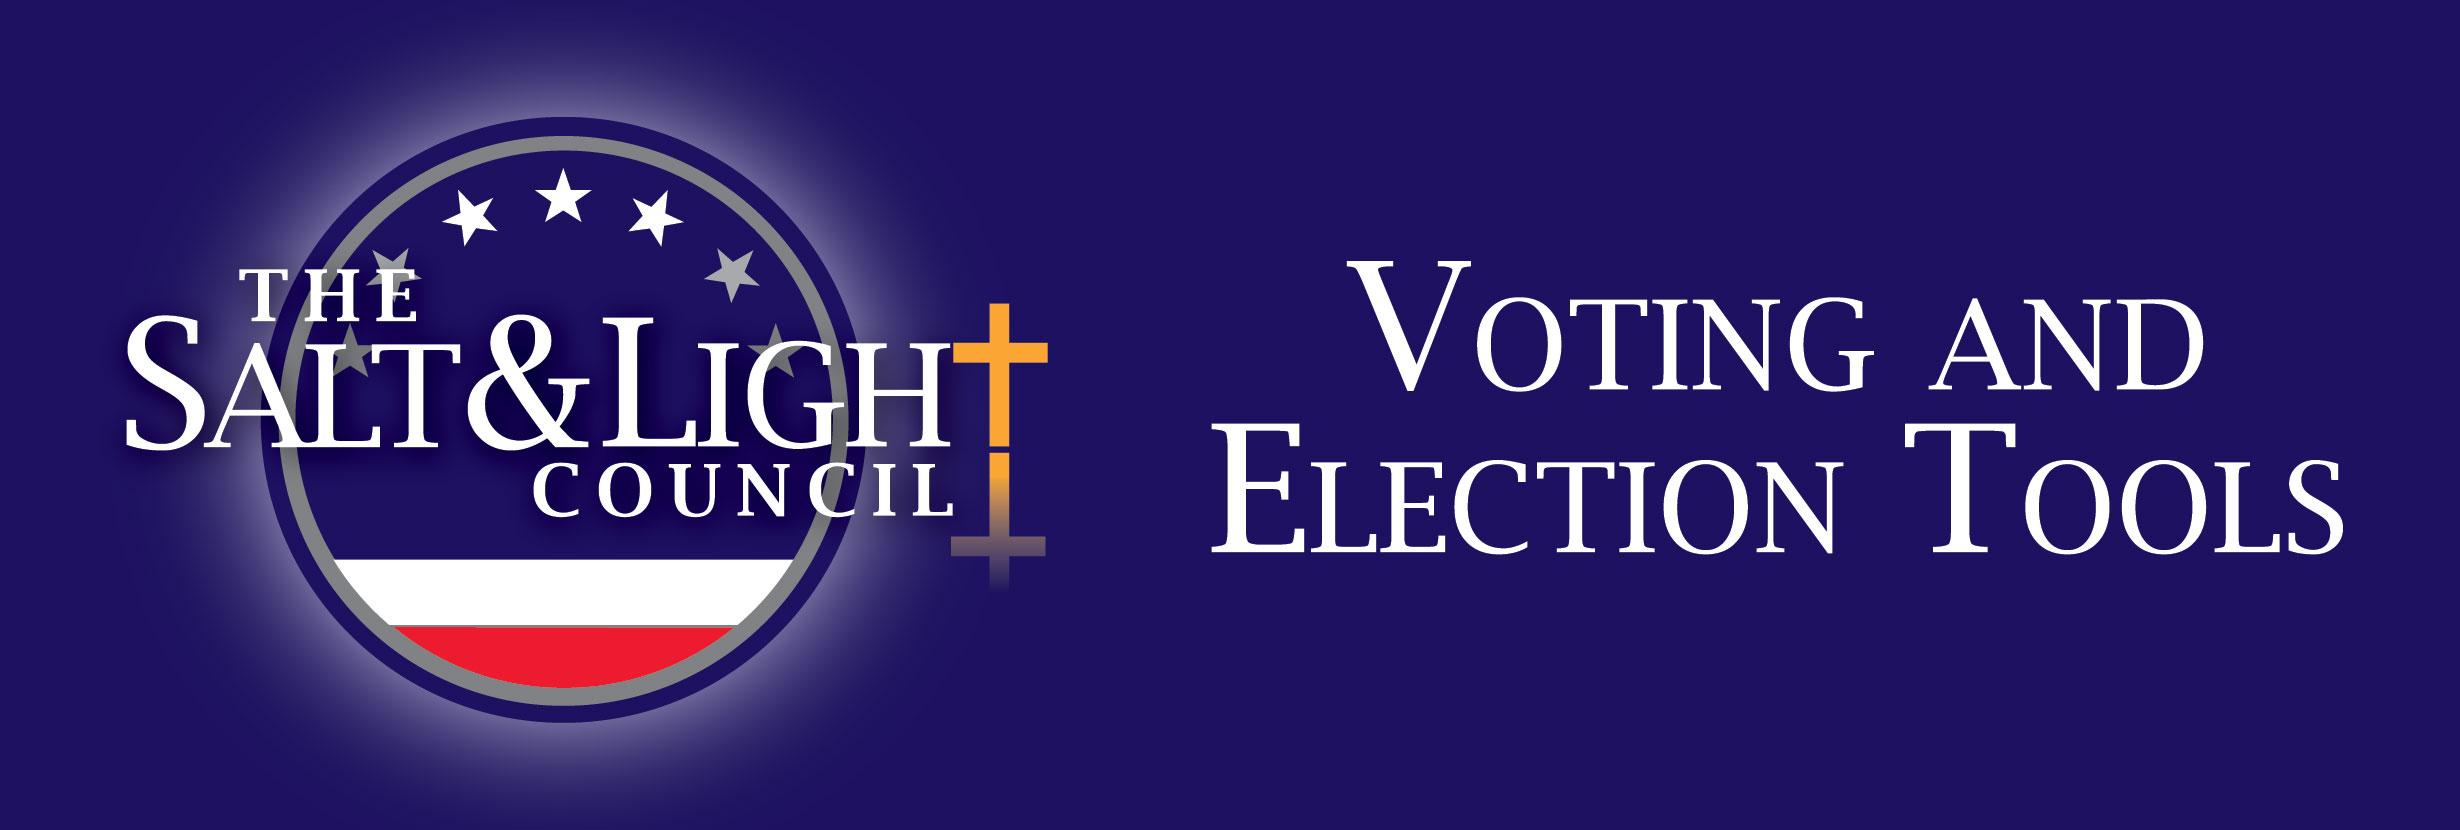 The Salt & Light Council Voting & Election Tools